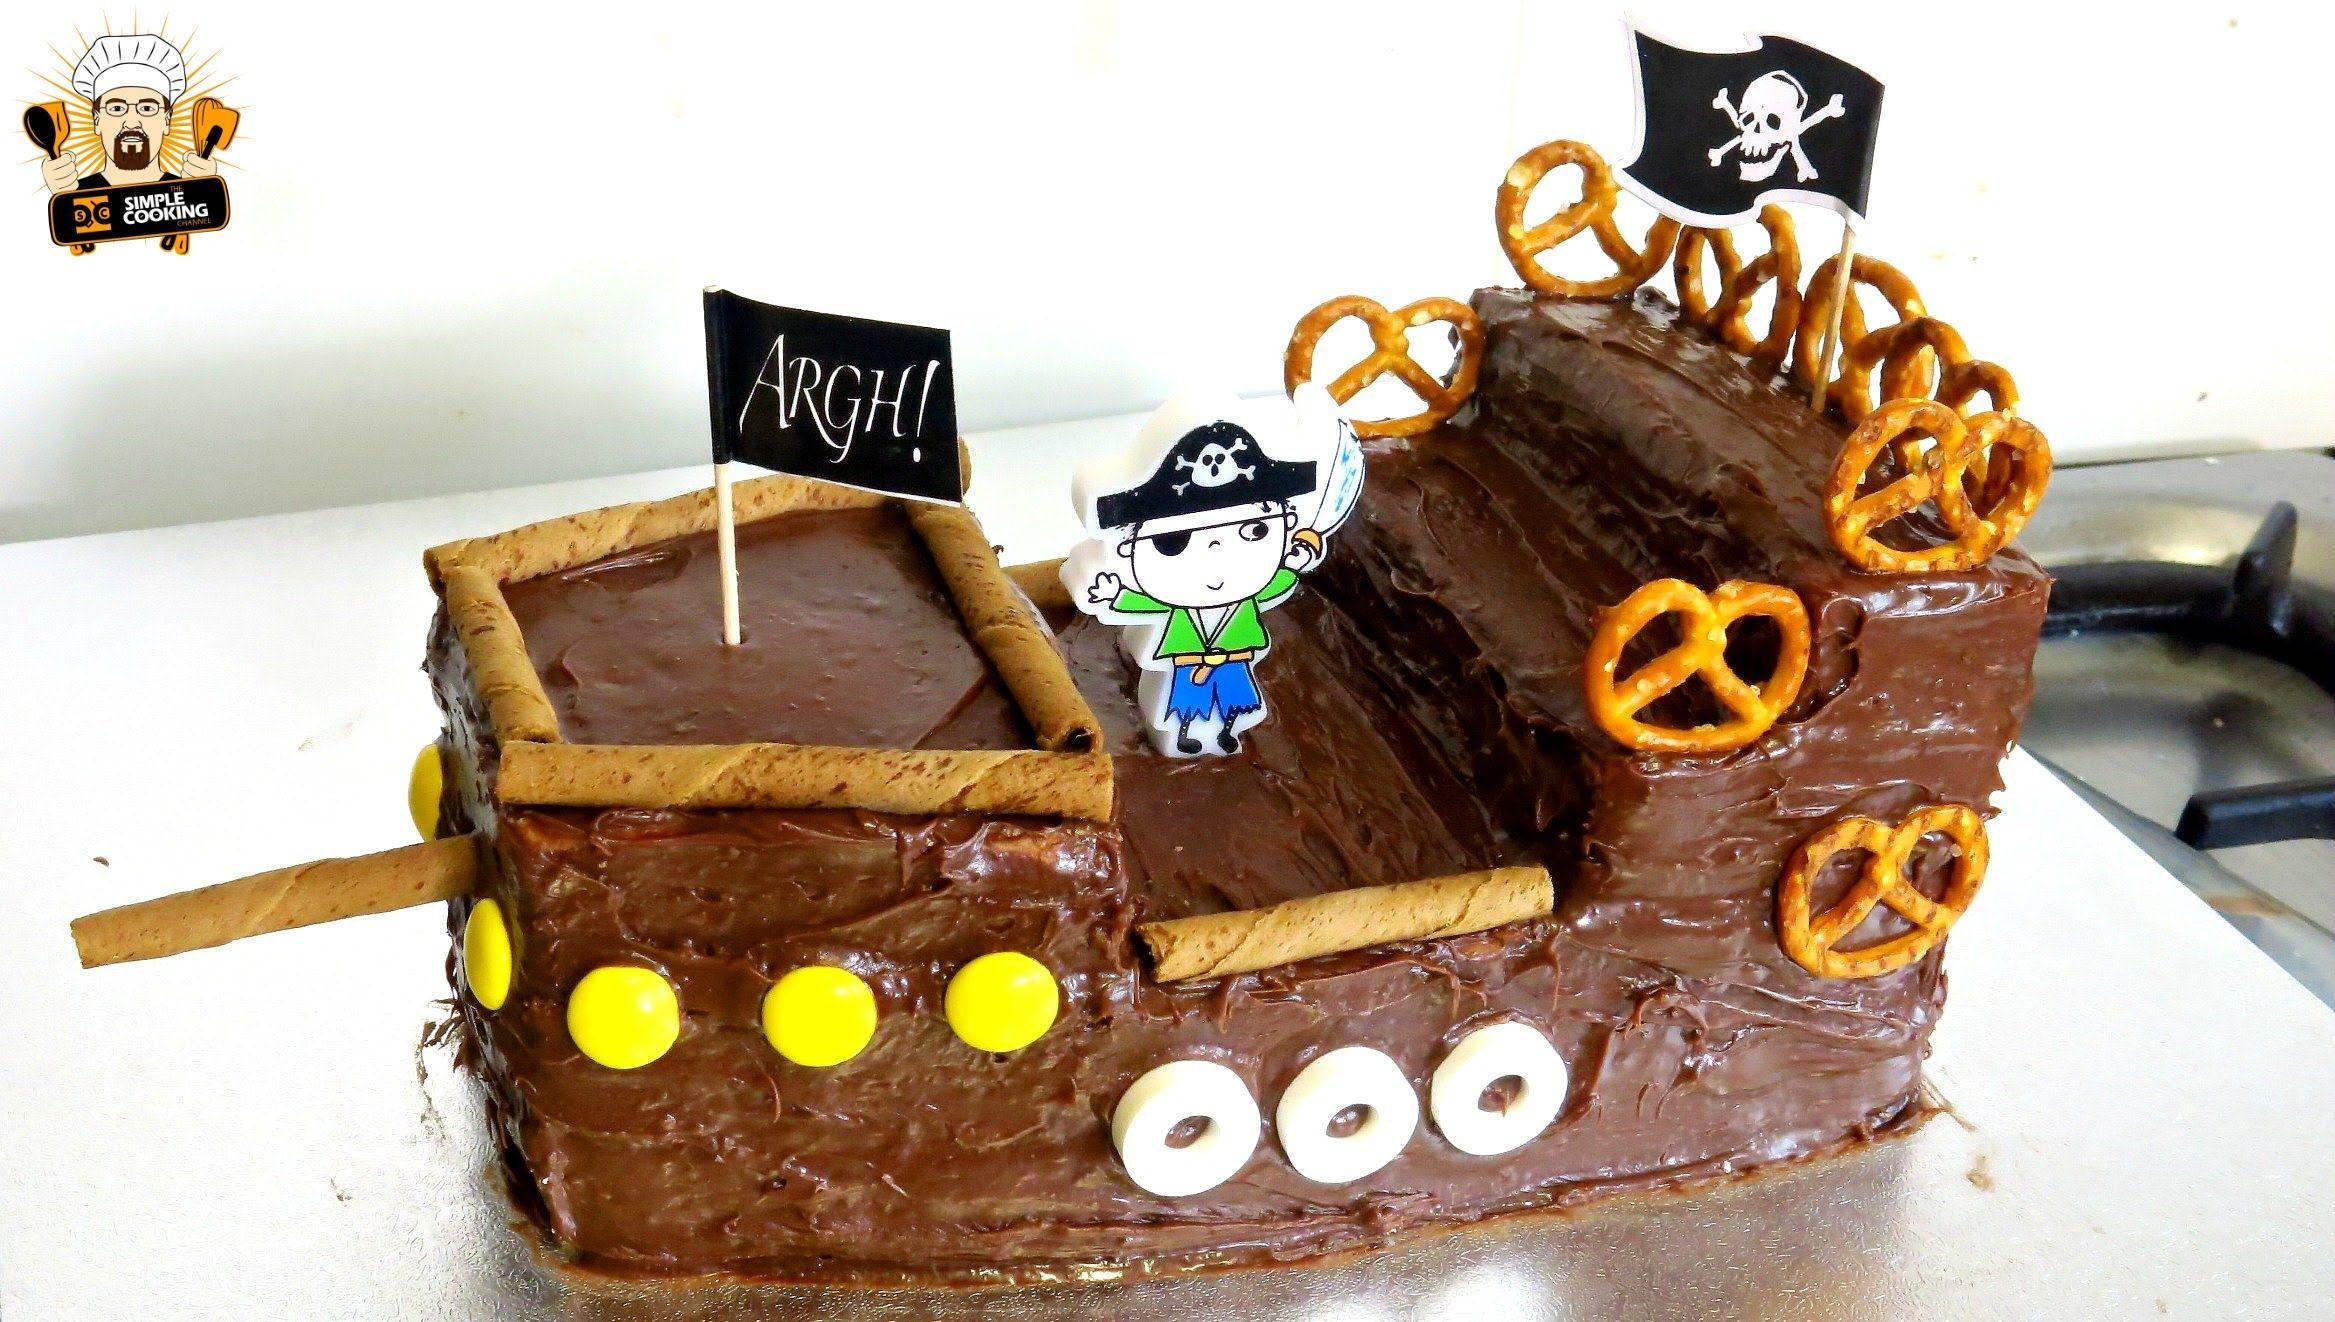 Easy pirate cake recipes pirate ship cakes pirate